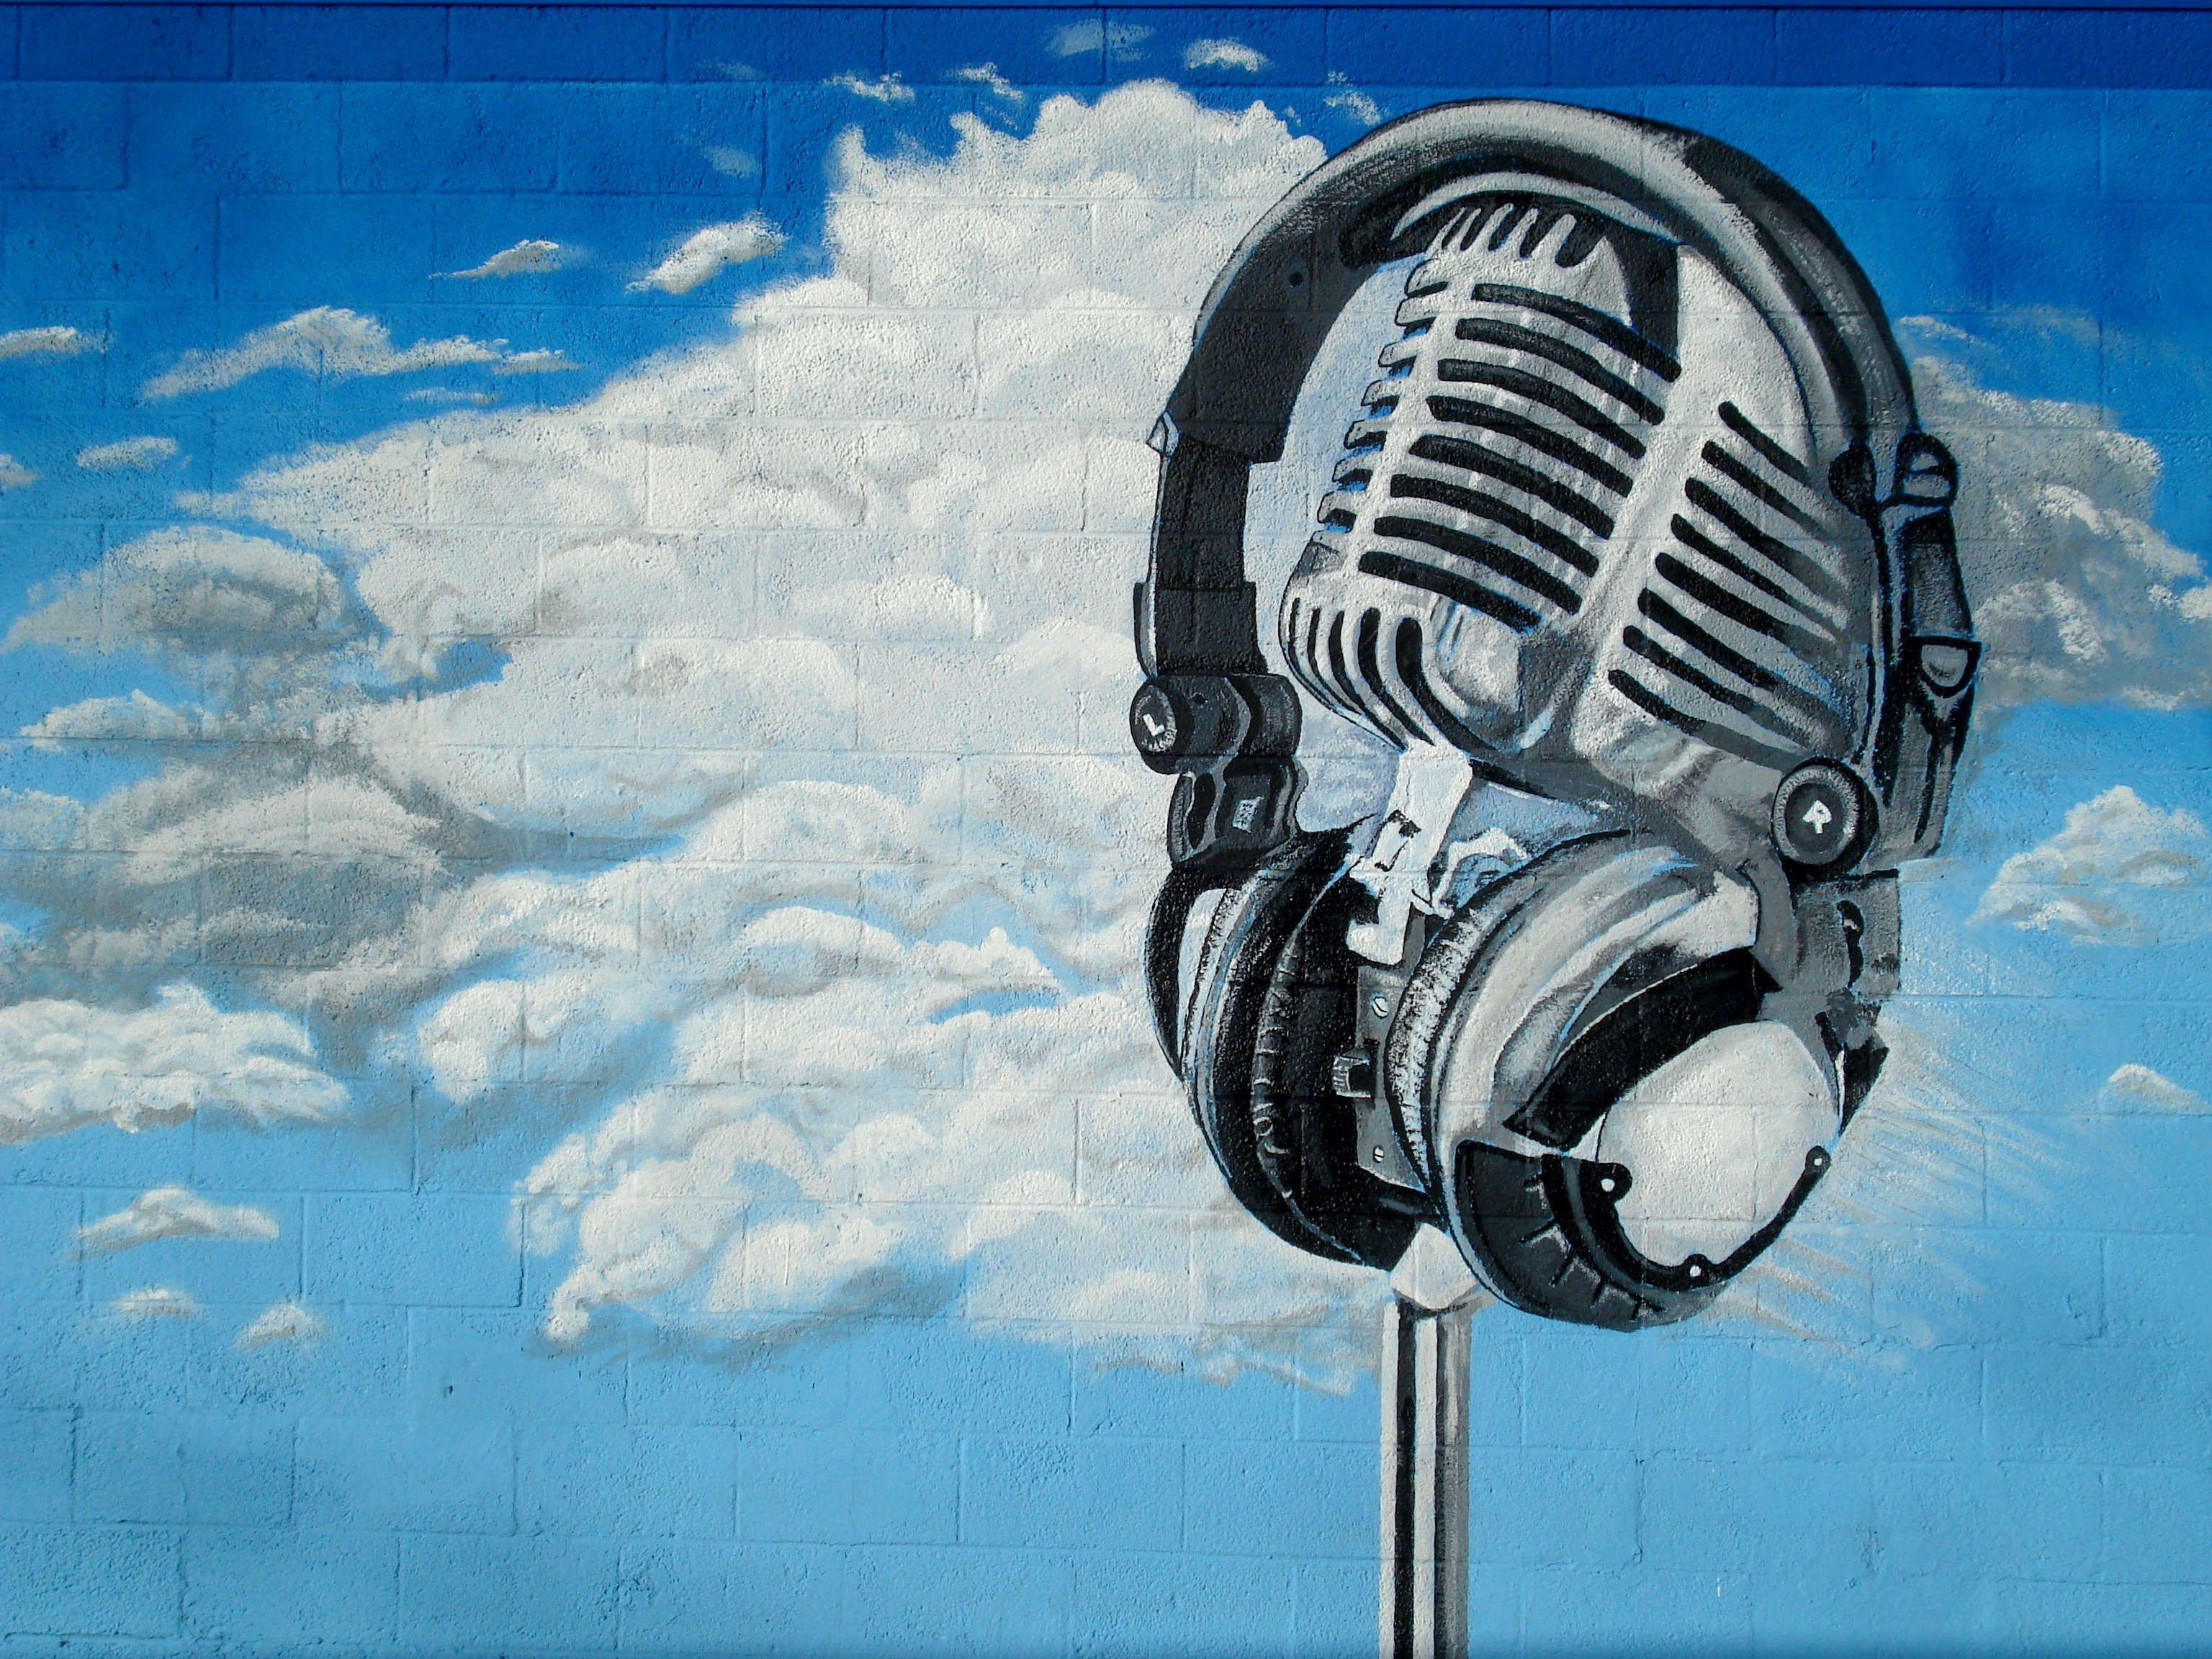 Arizona yavapai county yarnell - Arizona Sky Music Brick Classic Wall Clouds Vintage Painting Graffiti Mural January Headphones Microphone 365 Mic